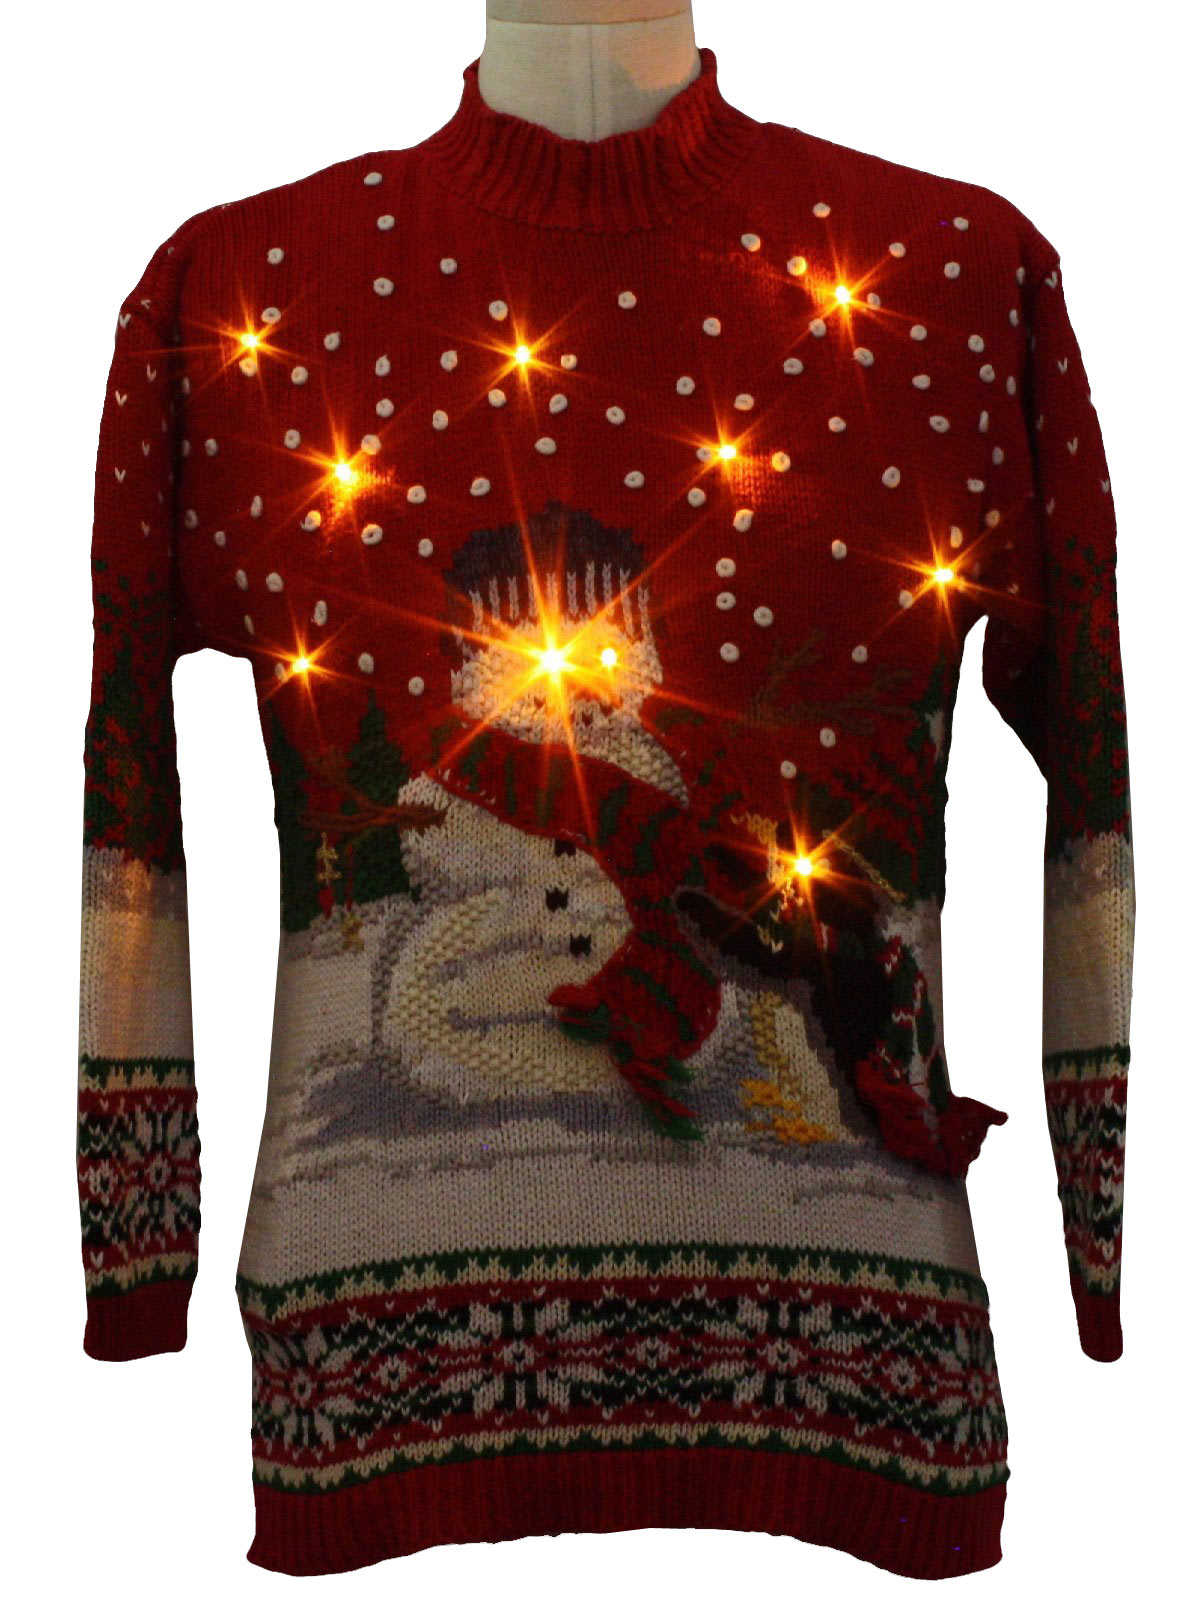 Ugly Dinosaur Christmas Sweater